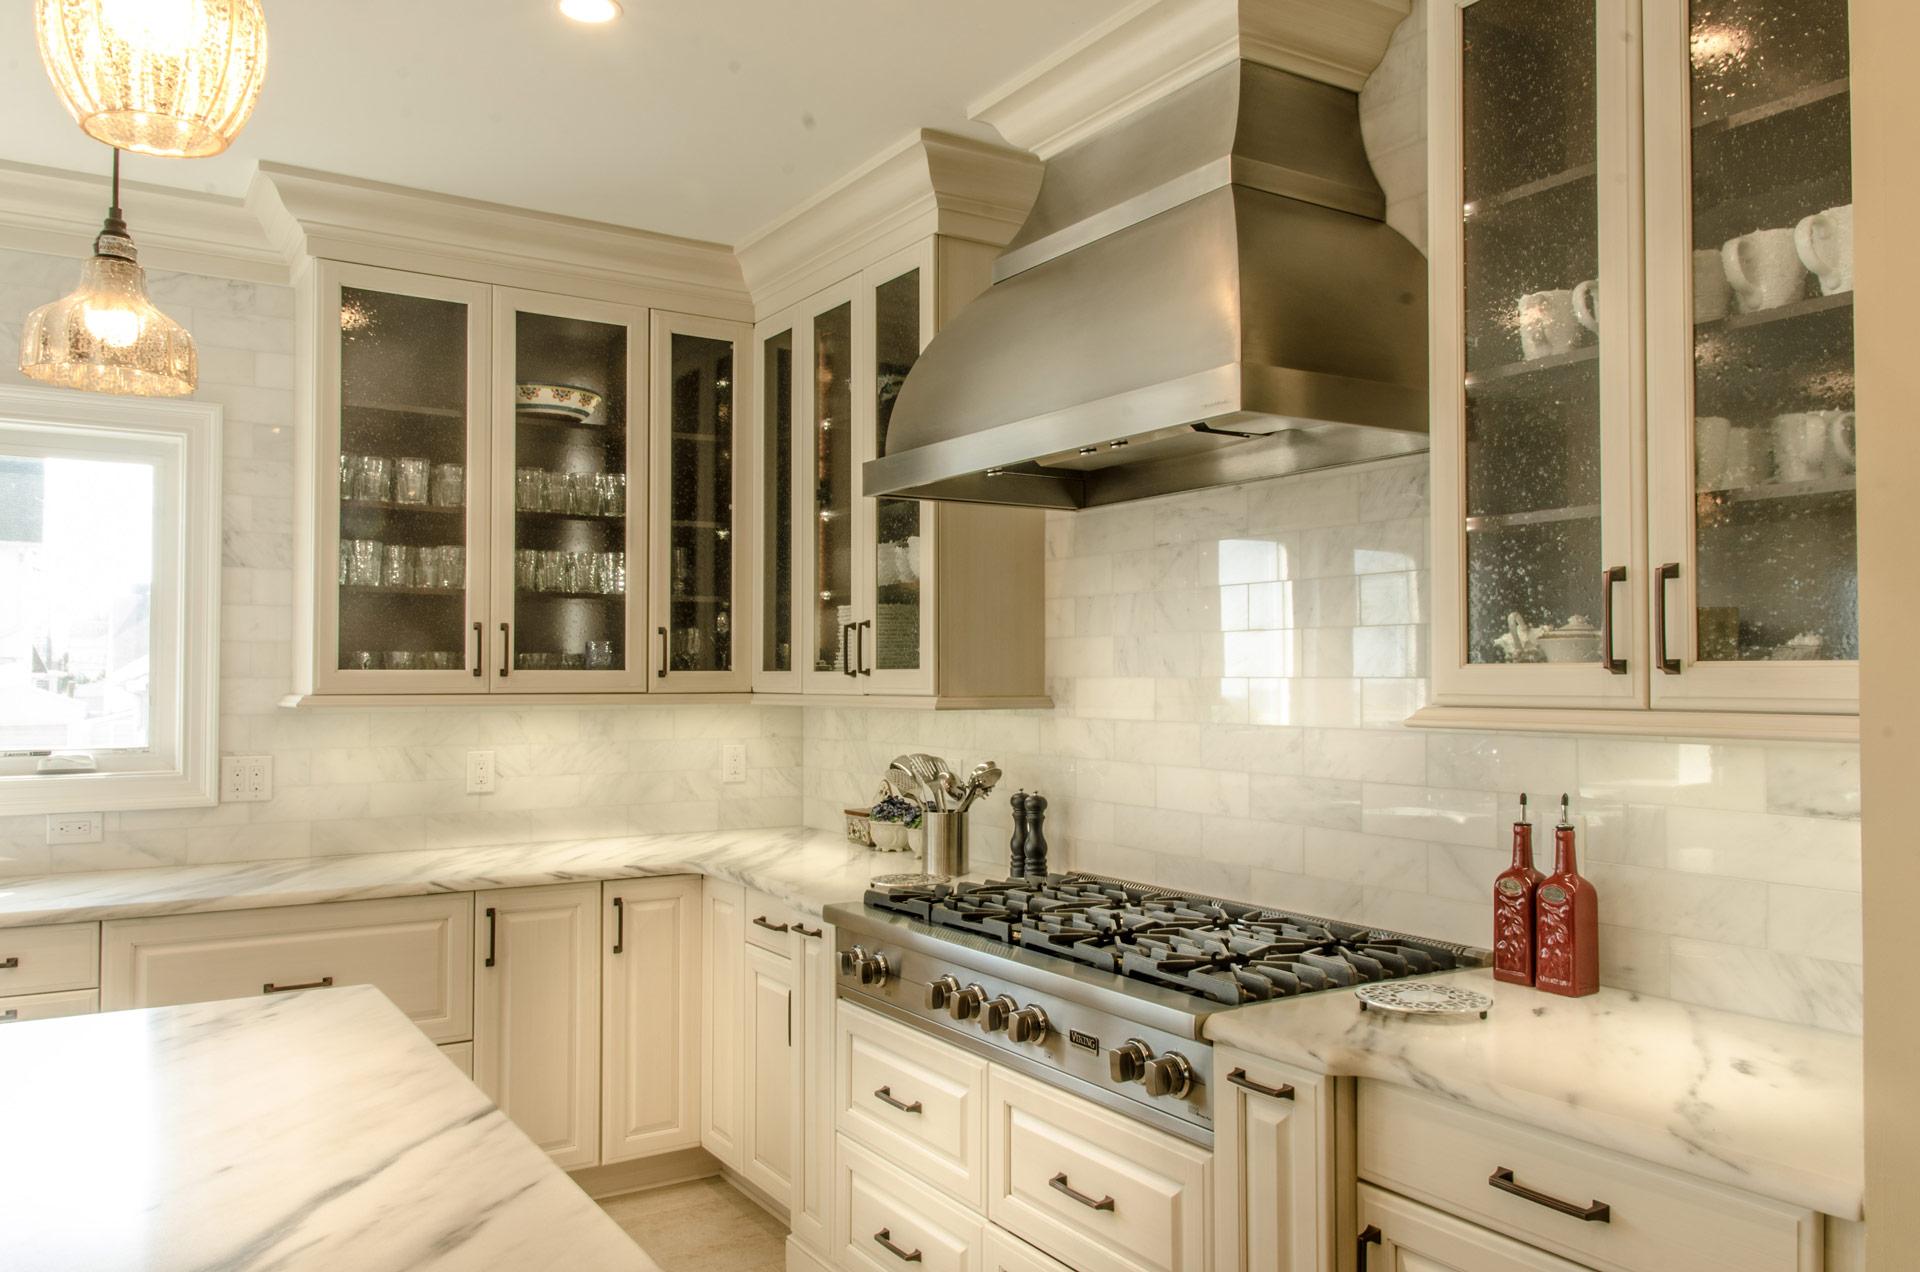 The Princeton Avalon >> Colmar Kitchen Bath Studio Margate Nj Avalon Nj